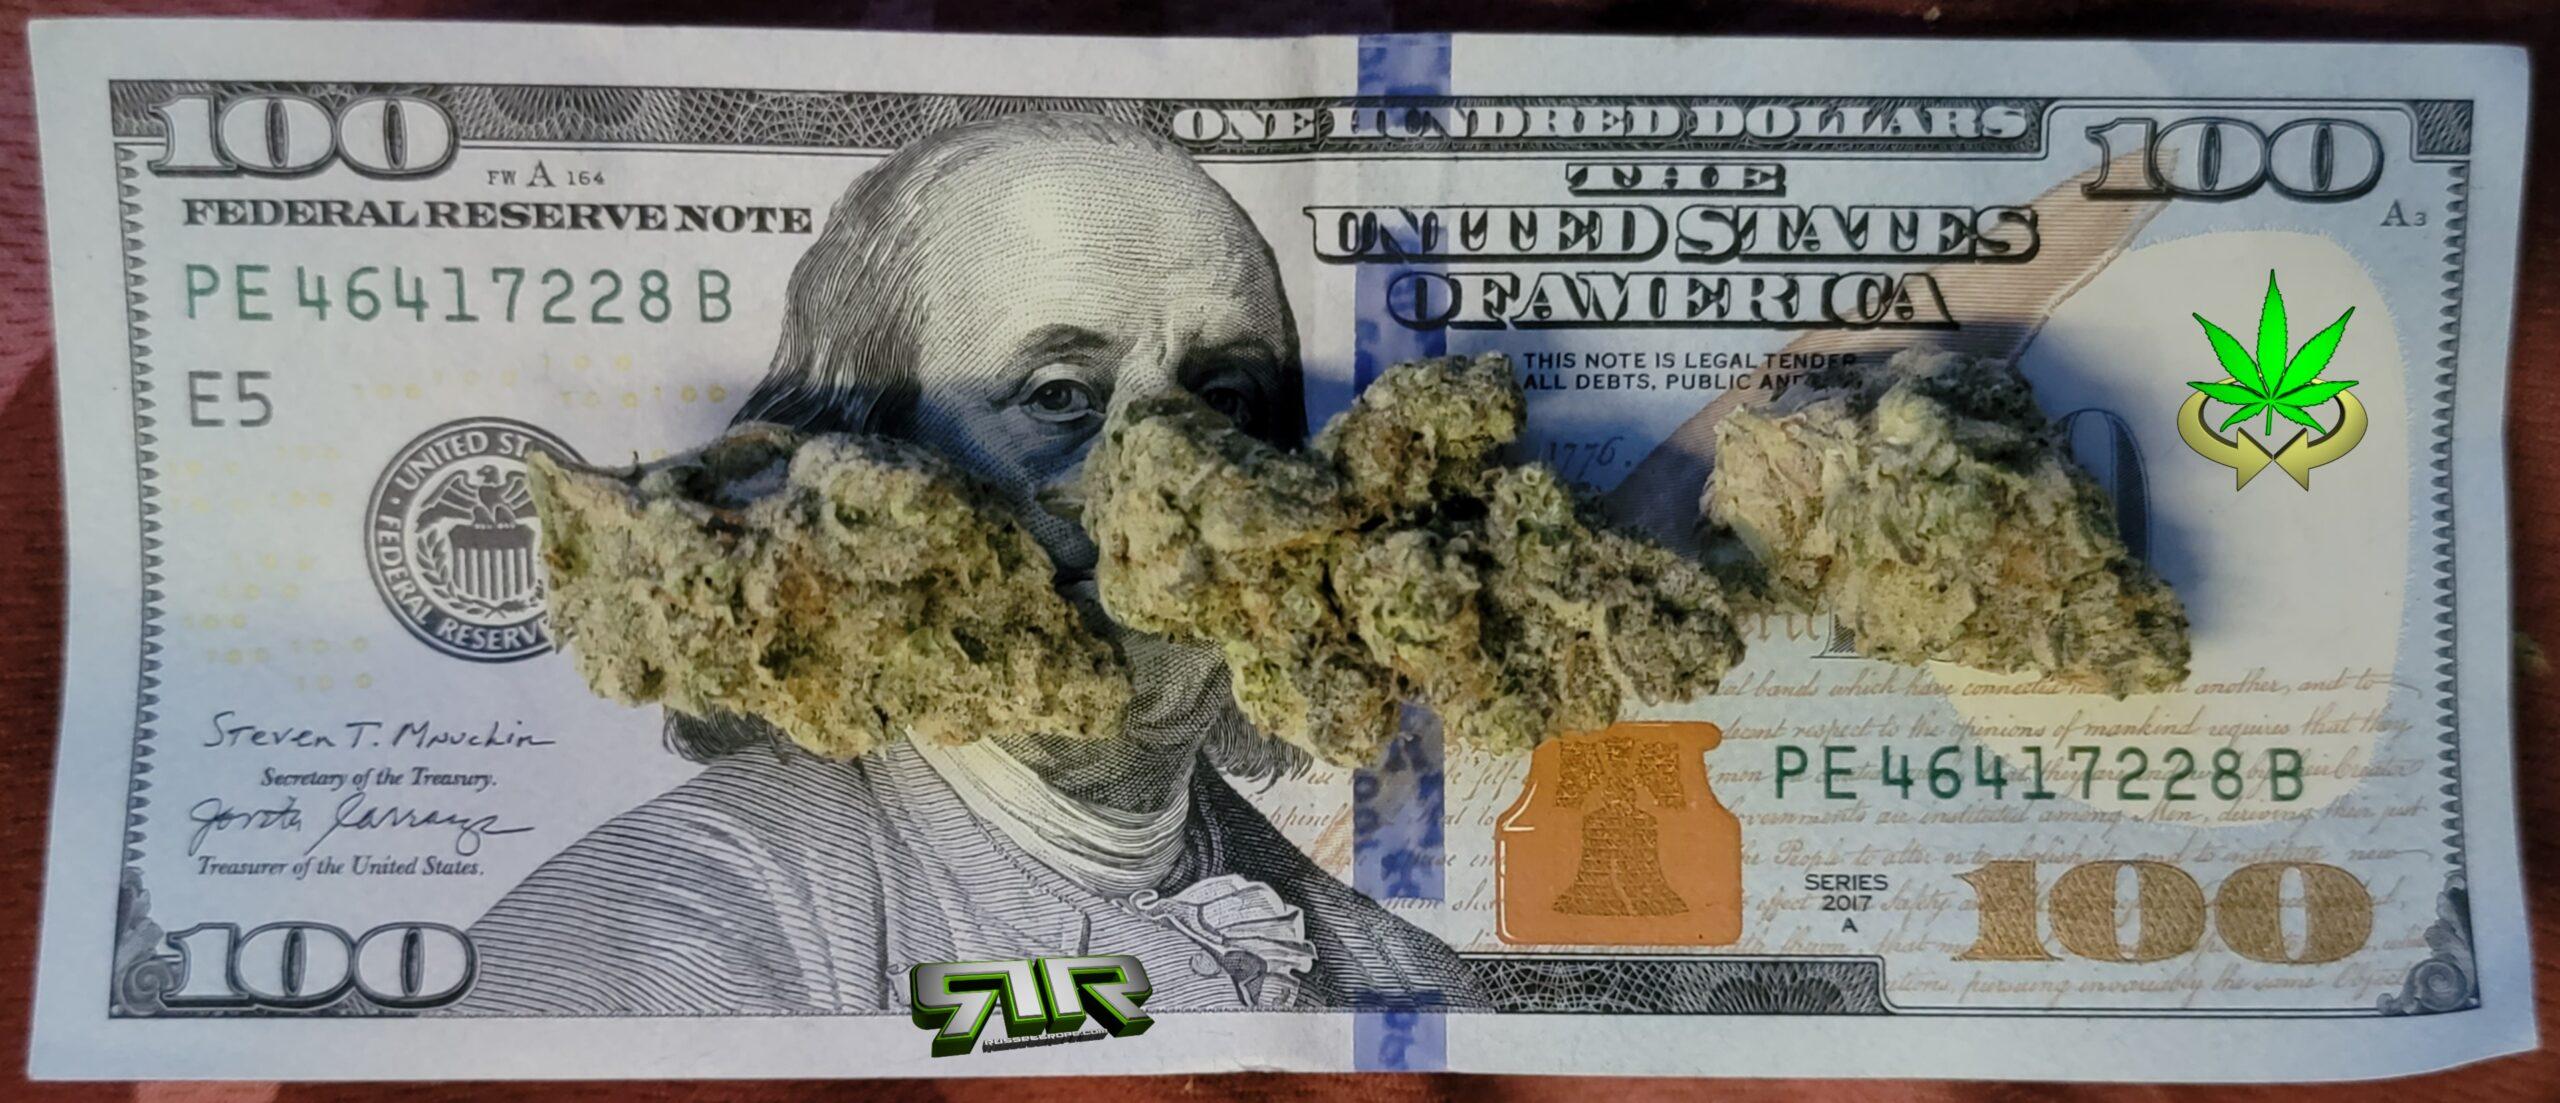 #Money @WeedConnection